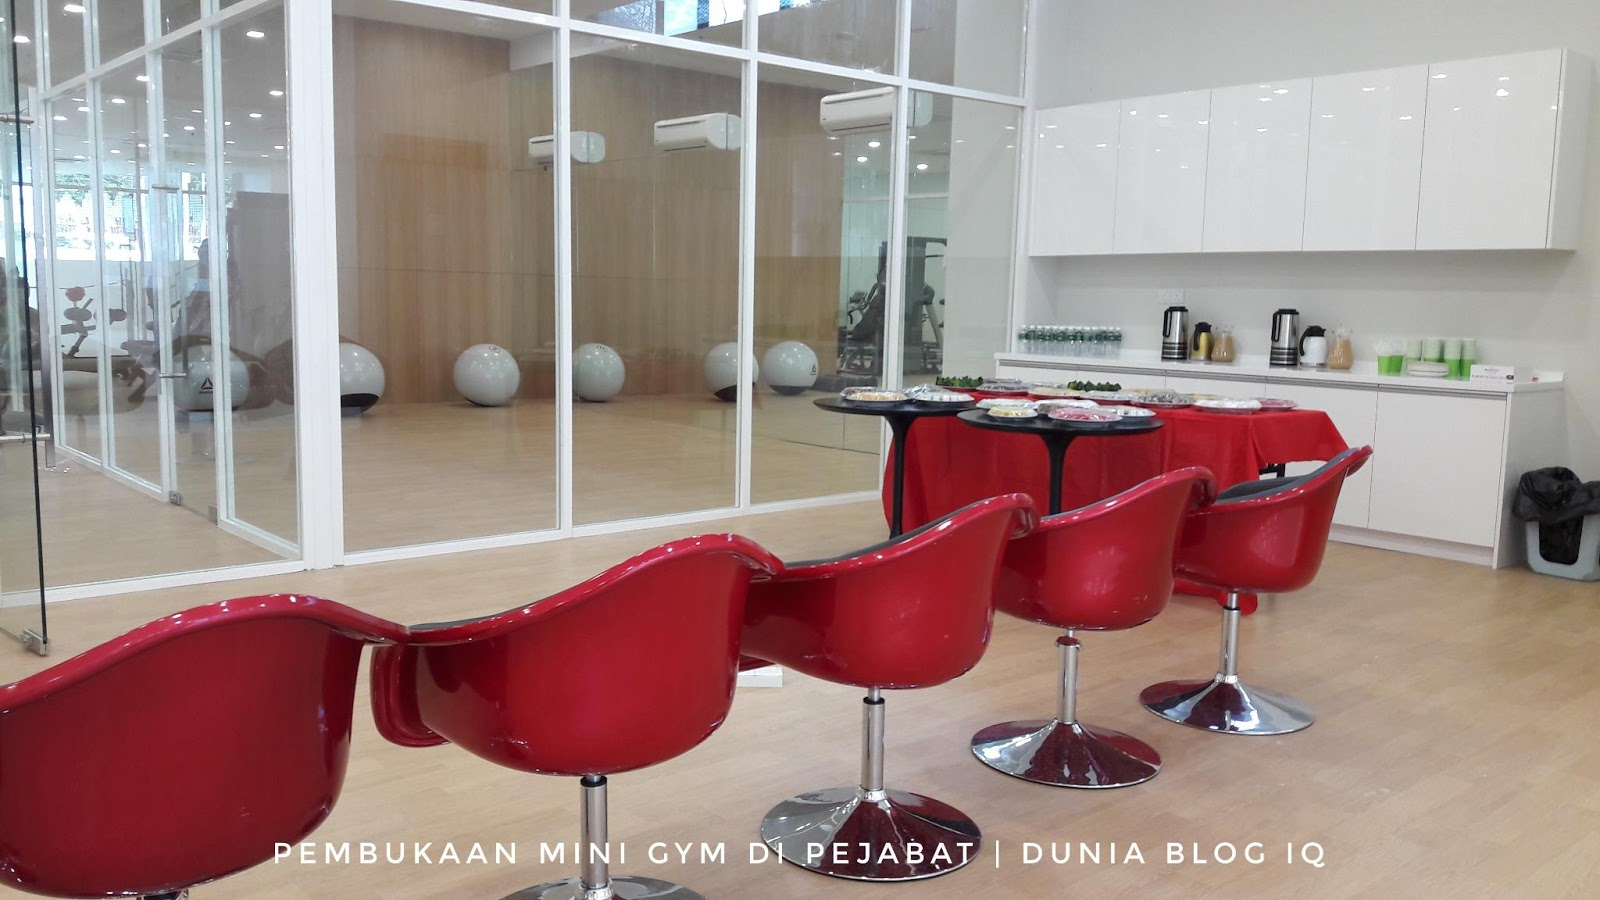 Pembukaan Mini Gym Di Pejabat